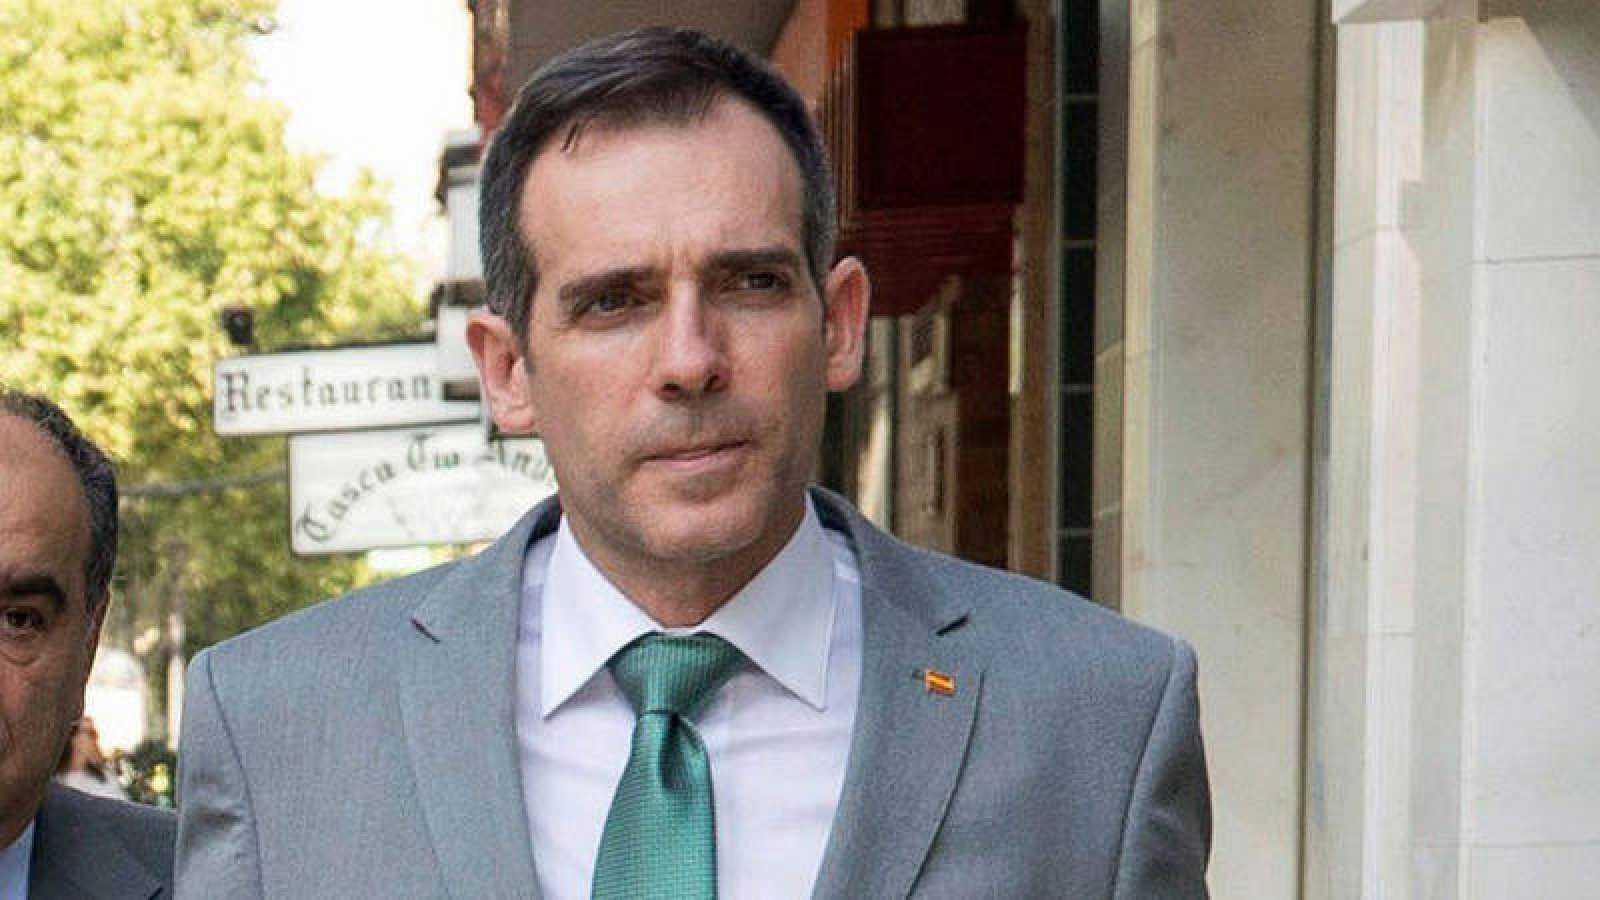 El portavoz de Vox en la Asamblea Regional de Murcia, Juan José Liarte.